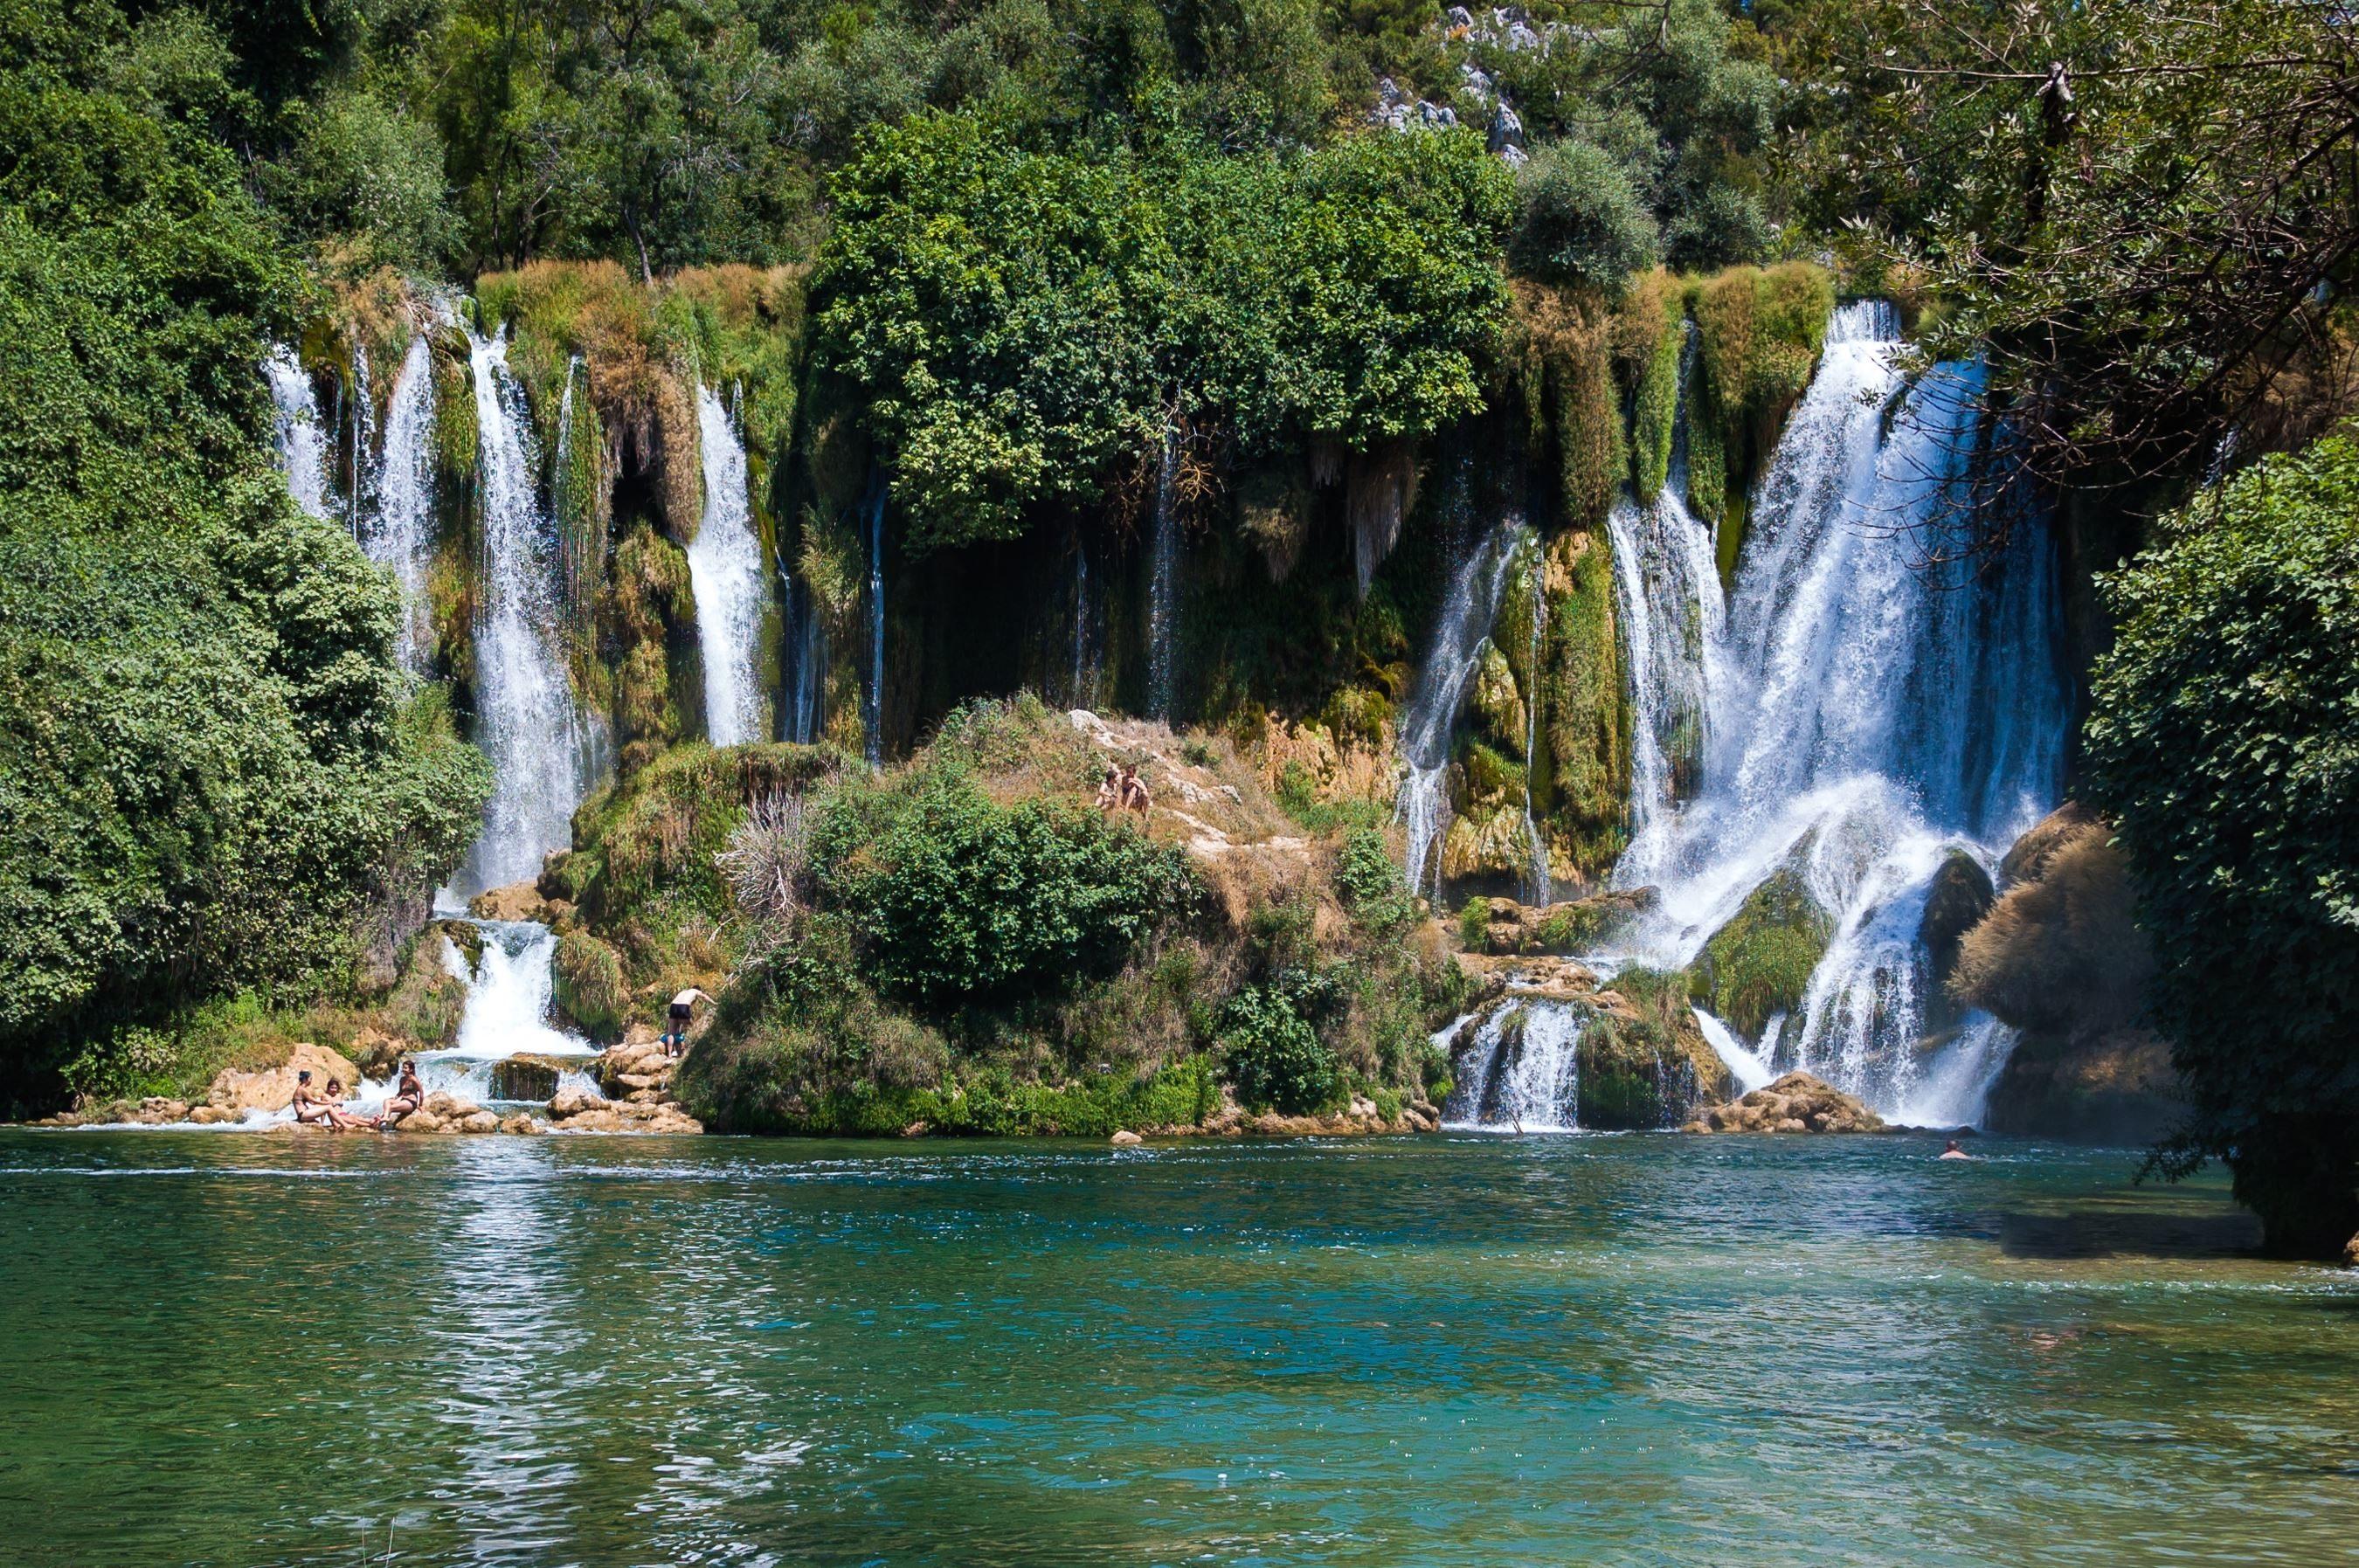 Waterfall Desktop Wallpaper Hd Imagen Gratis Cascada R 237 O Agua Corriente Roca Bosque